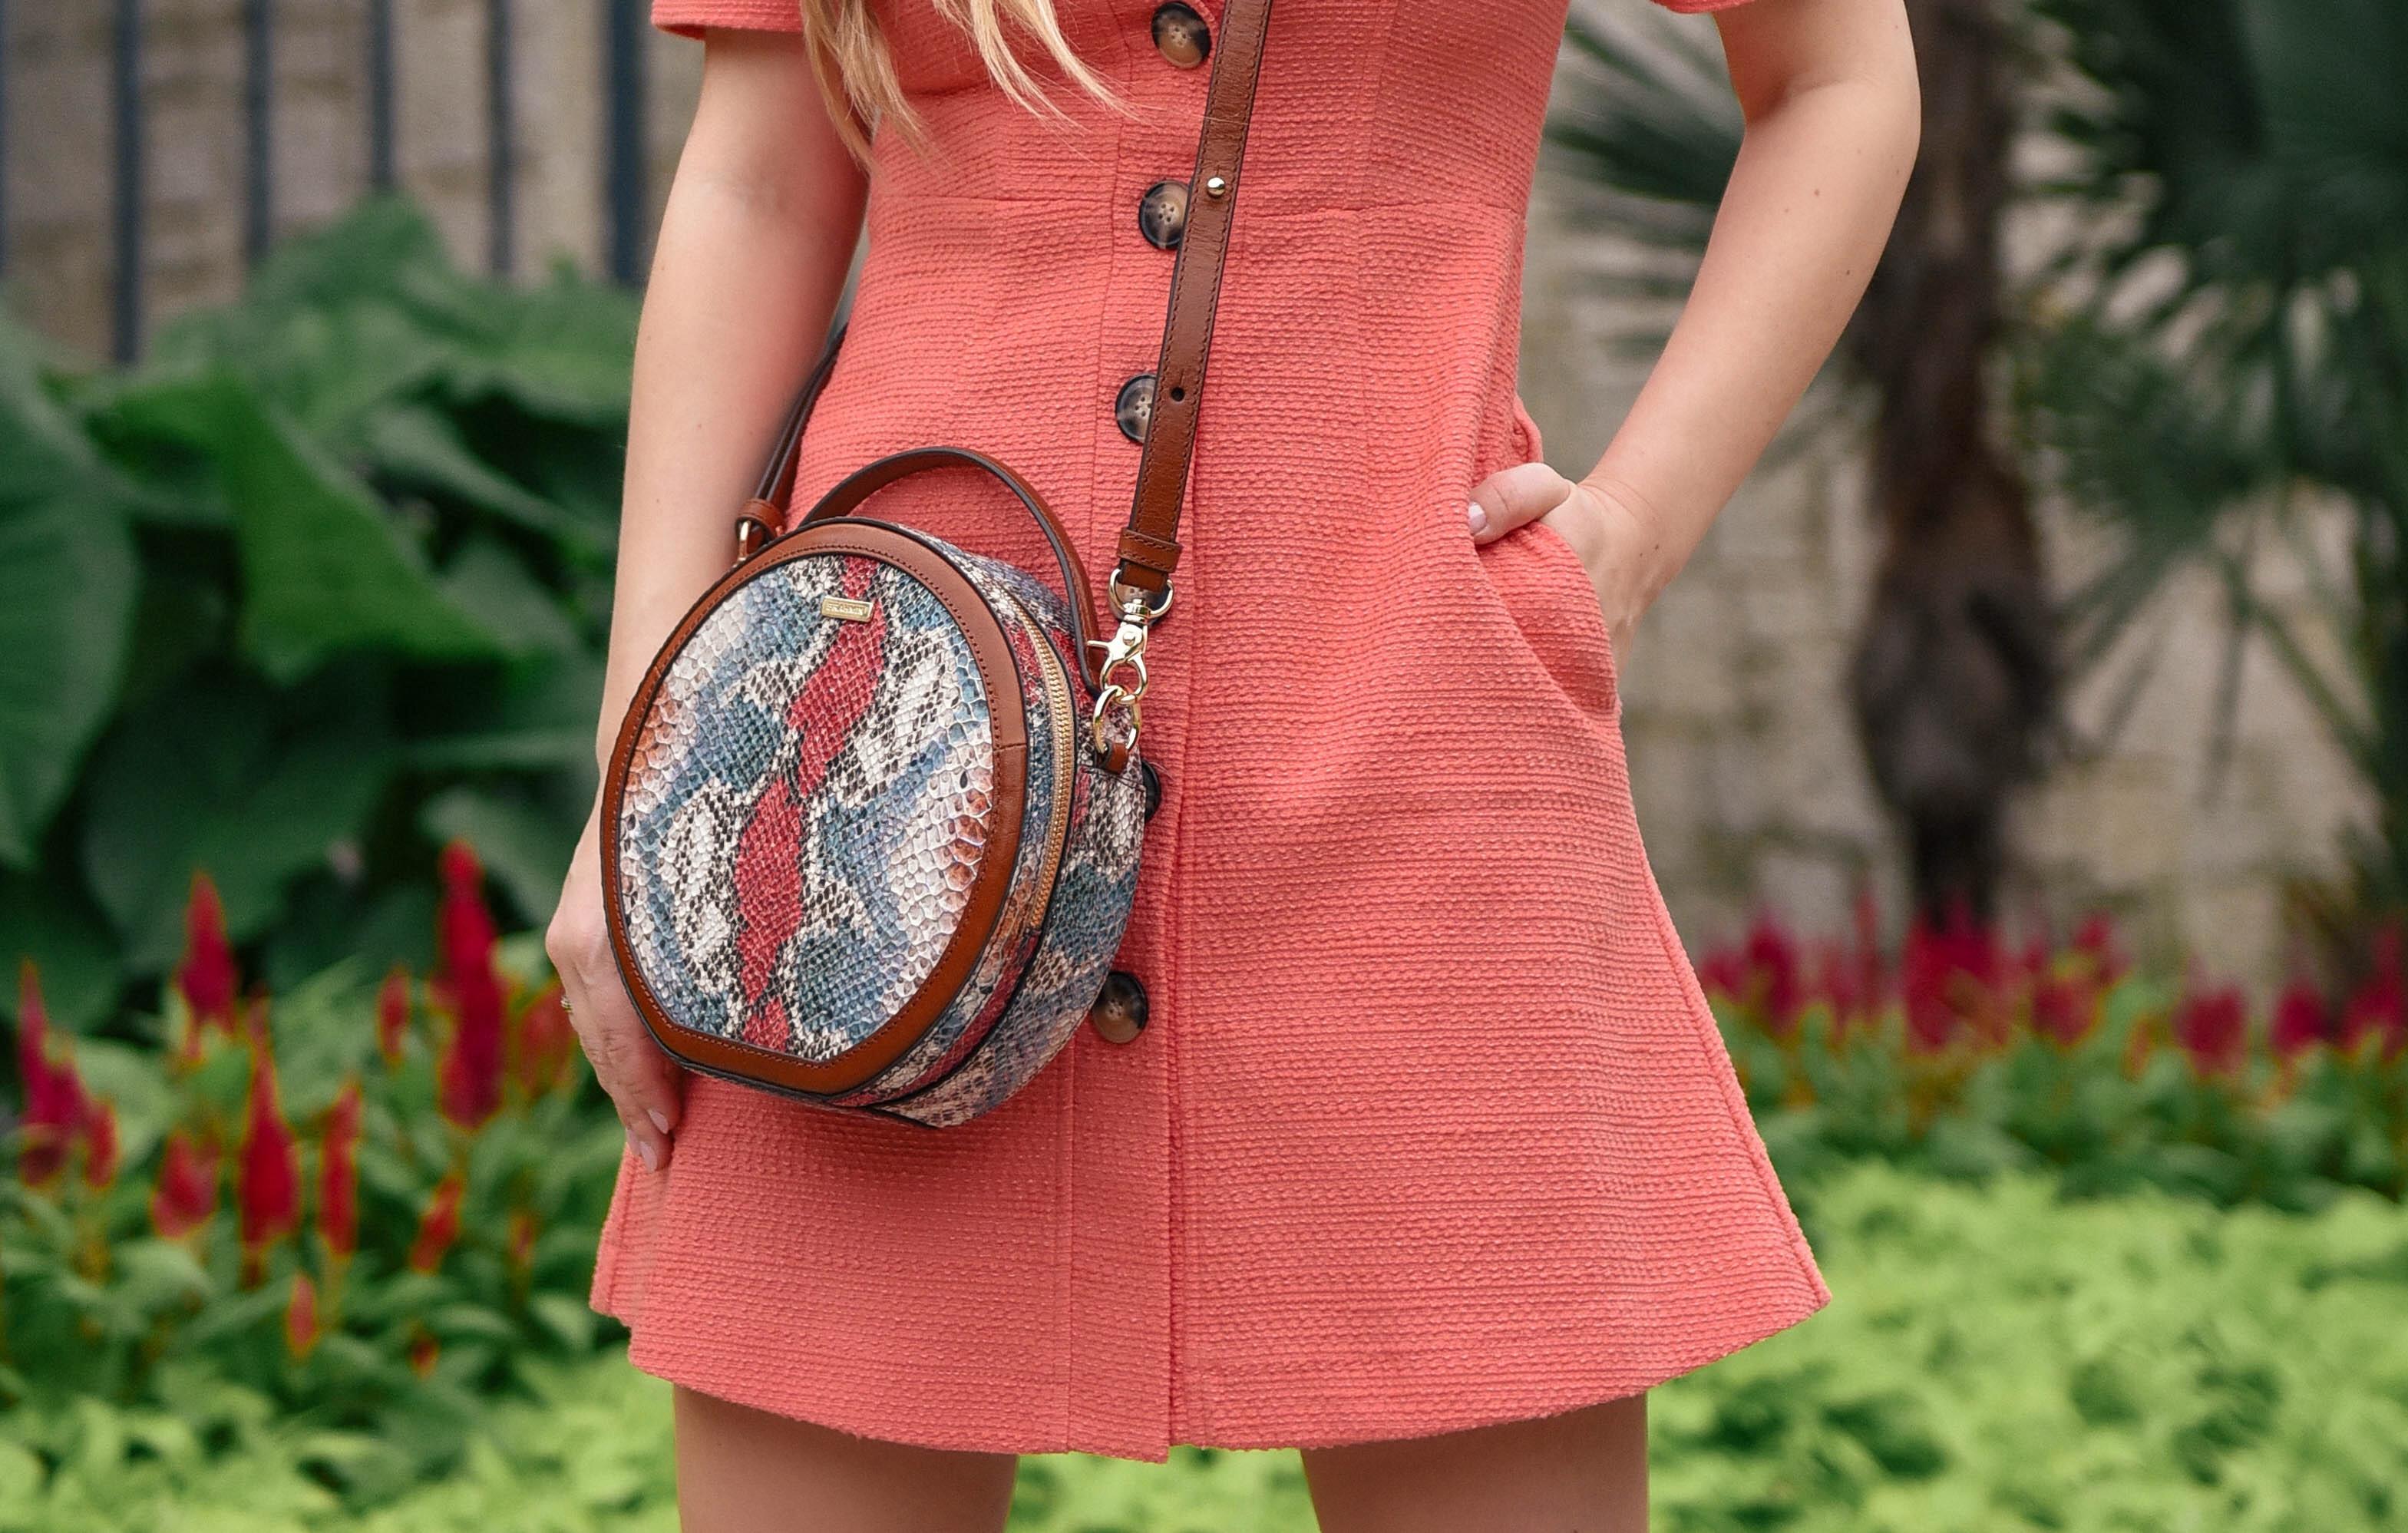 Lo-Murphy-Brahmin-Designer-Handbag-Gal-Meets-Glam-Collection-Leather-Bag-Dallas-Blogger-crossbody-bag